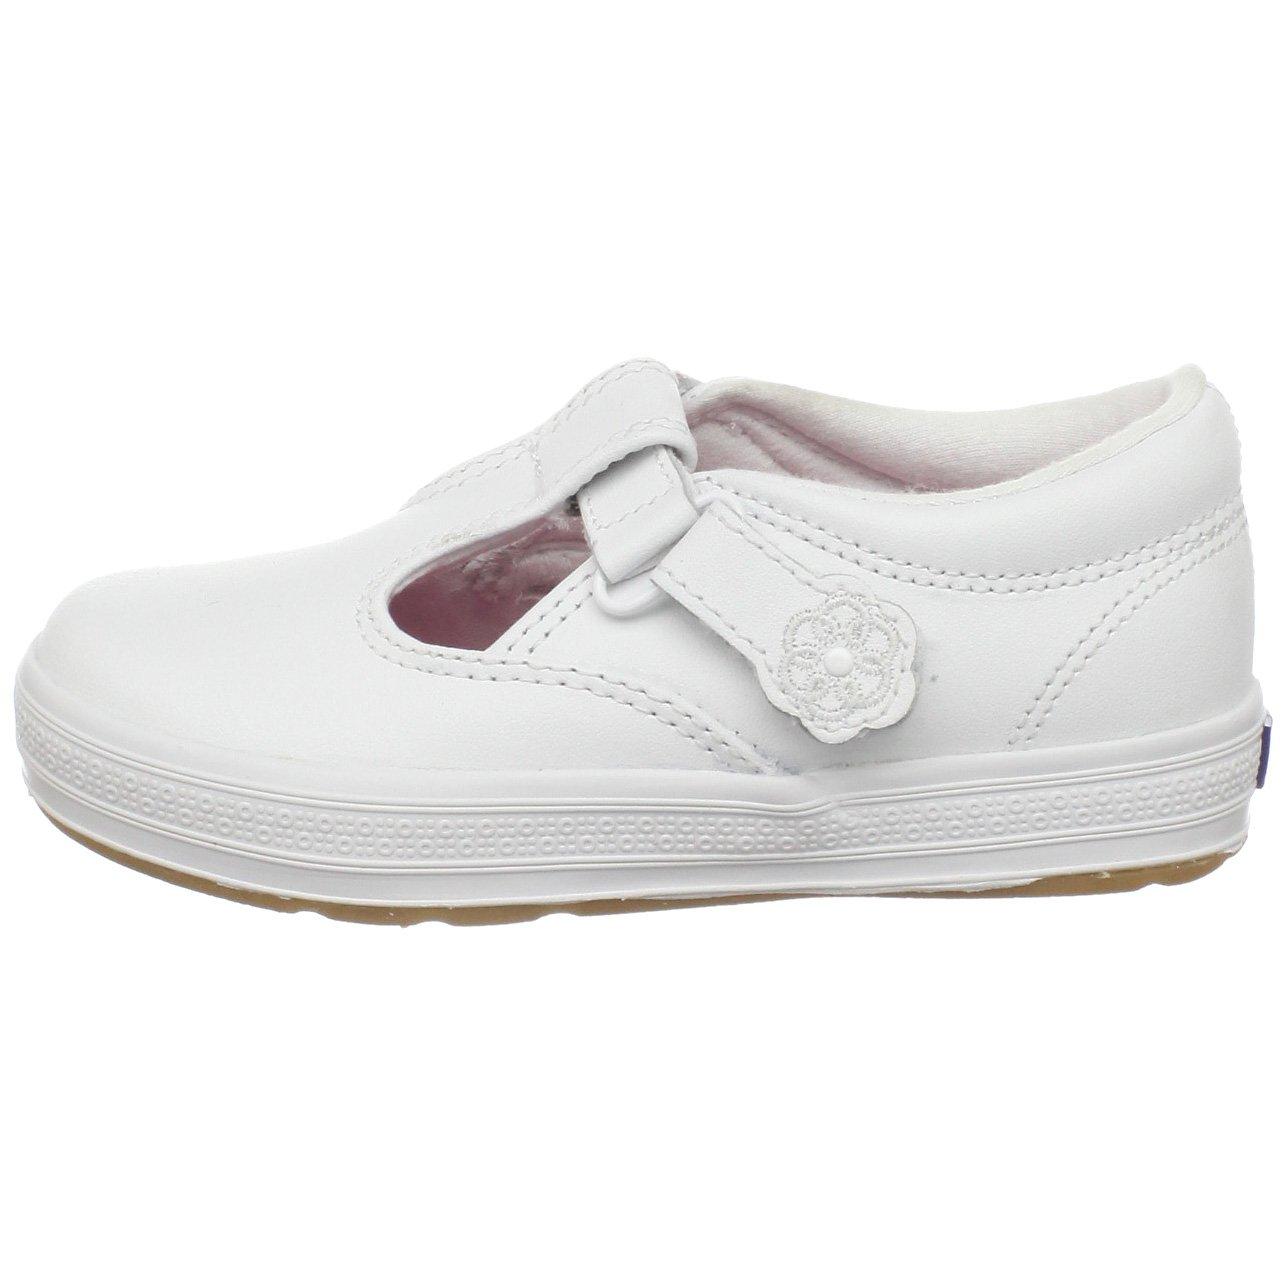 Keds Daphne T-Strap Sneaker (Toddler/Little Kid), White, 12 M US Little Kid by Keds (Image #5)